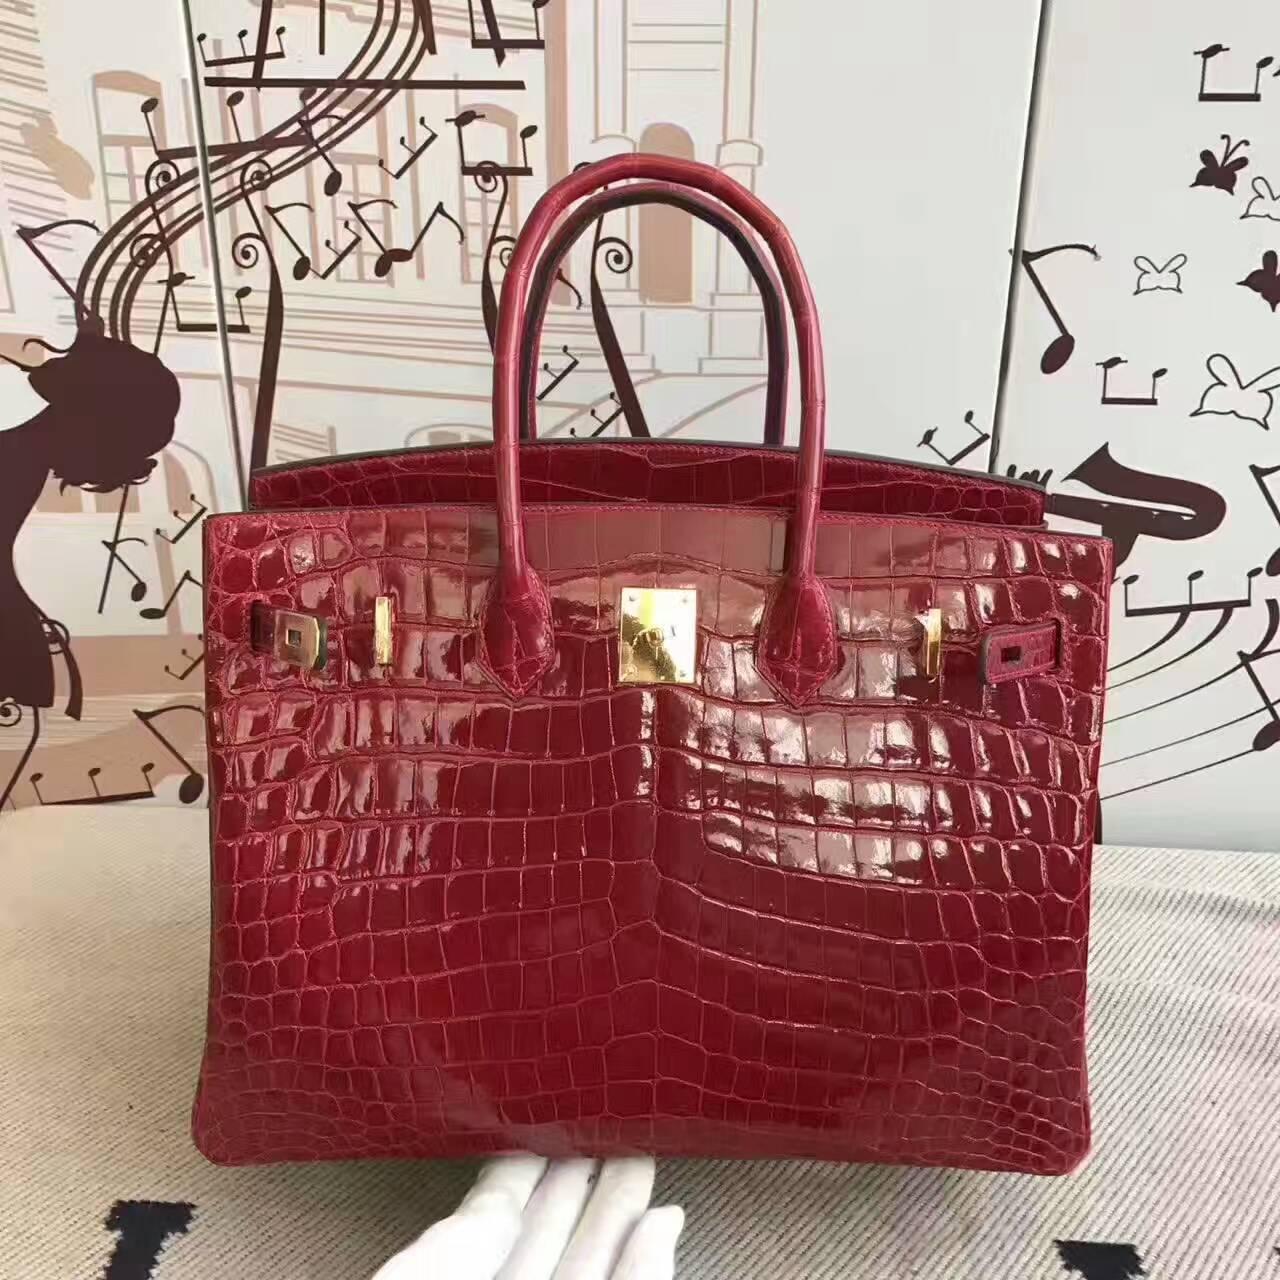 Discount Hermes  CK55 Rouge Hermes Crocodile Shiny Leather Birkin 35cm Bag